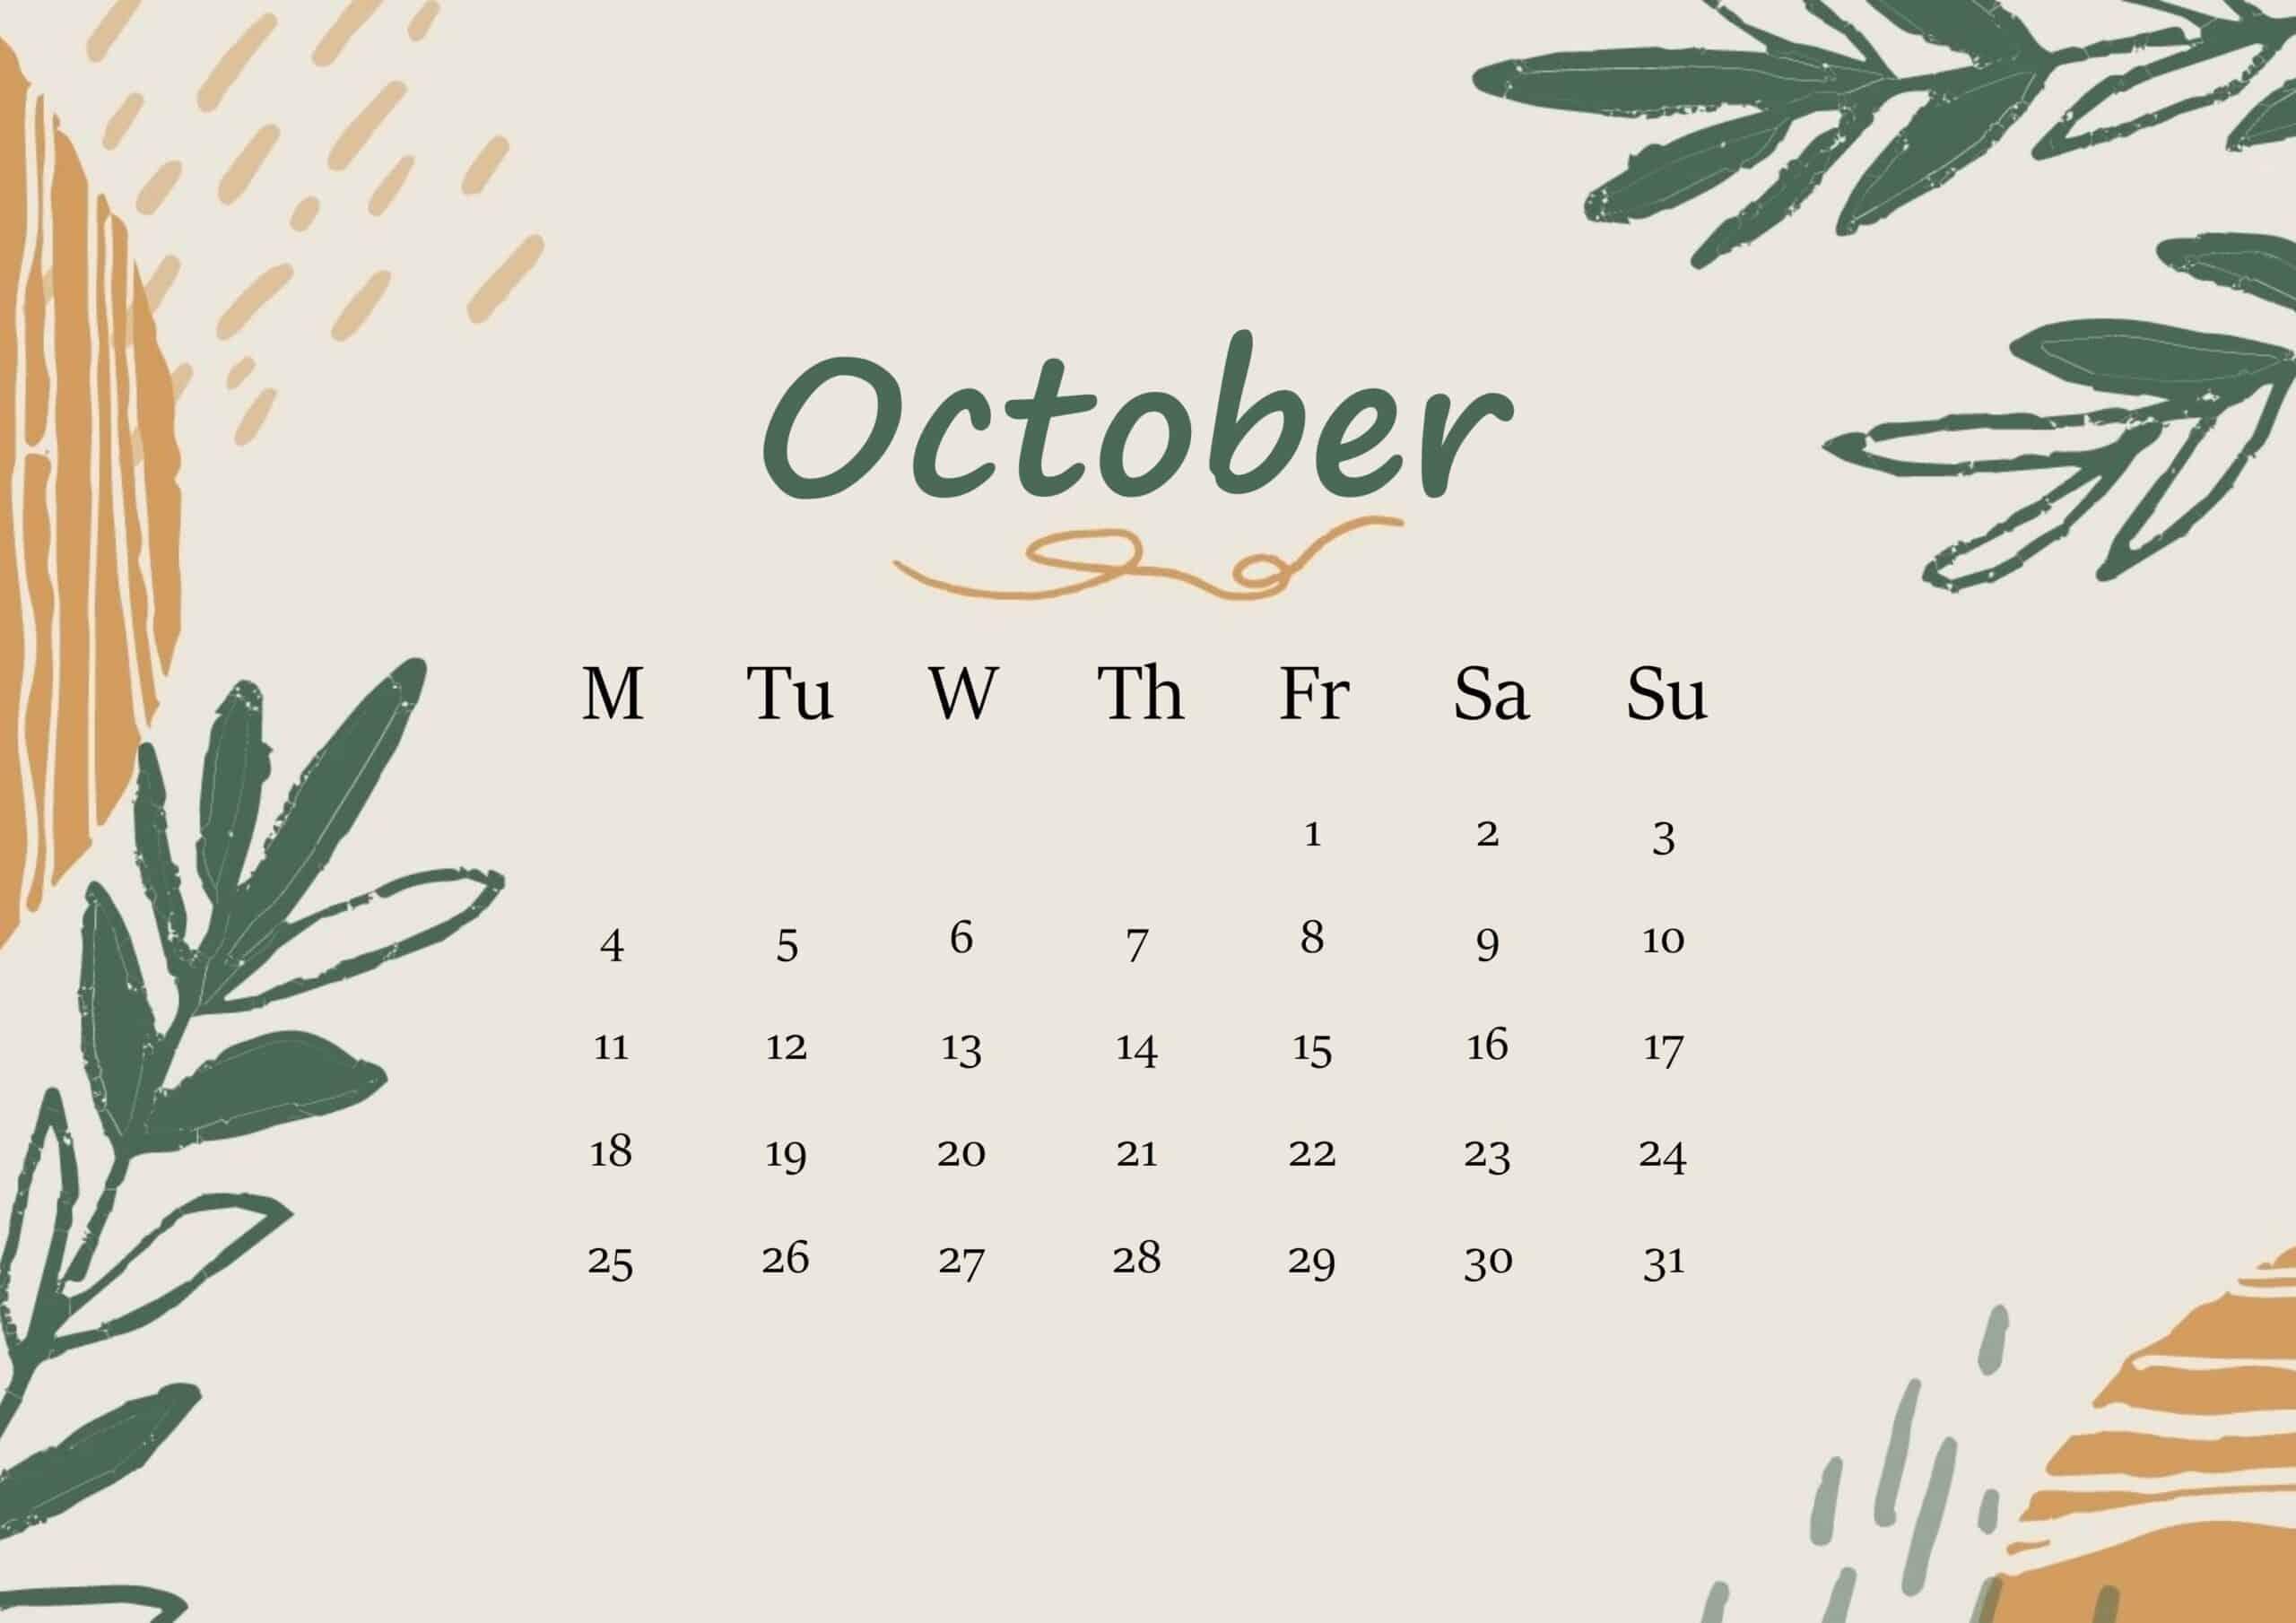 October 2021 Calendar Floral